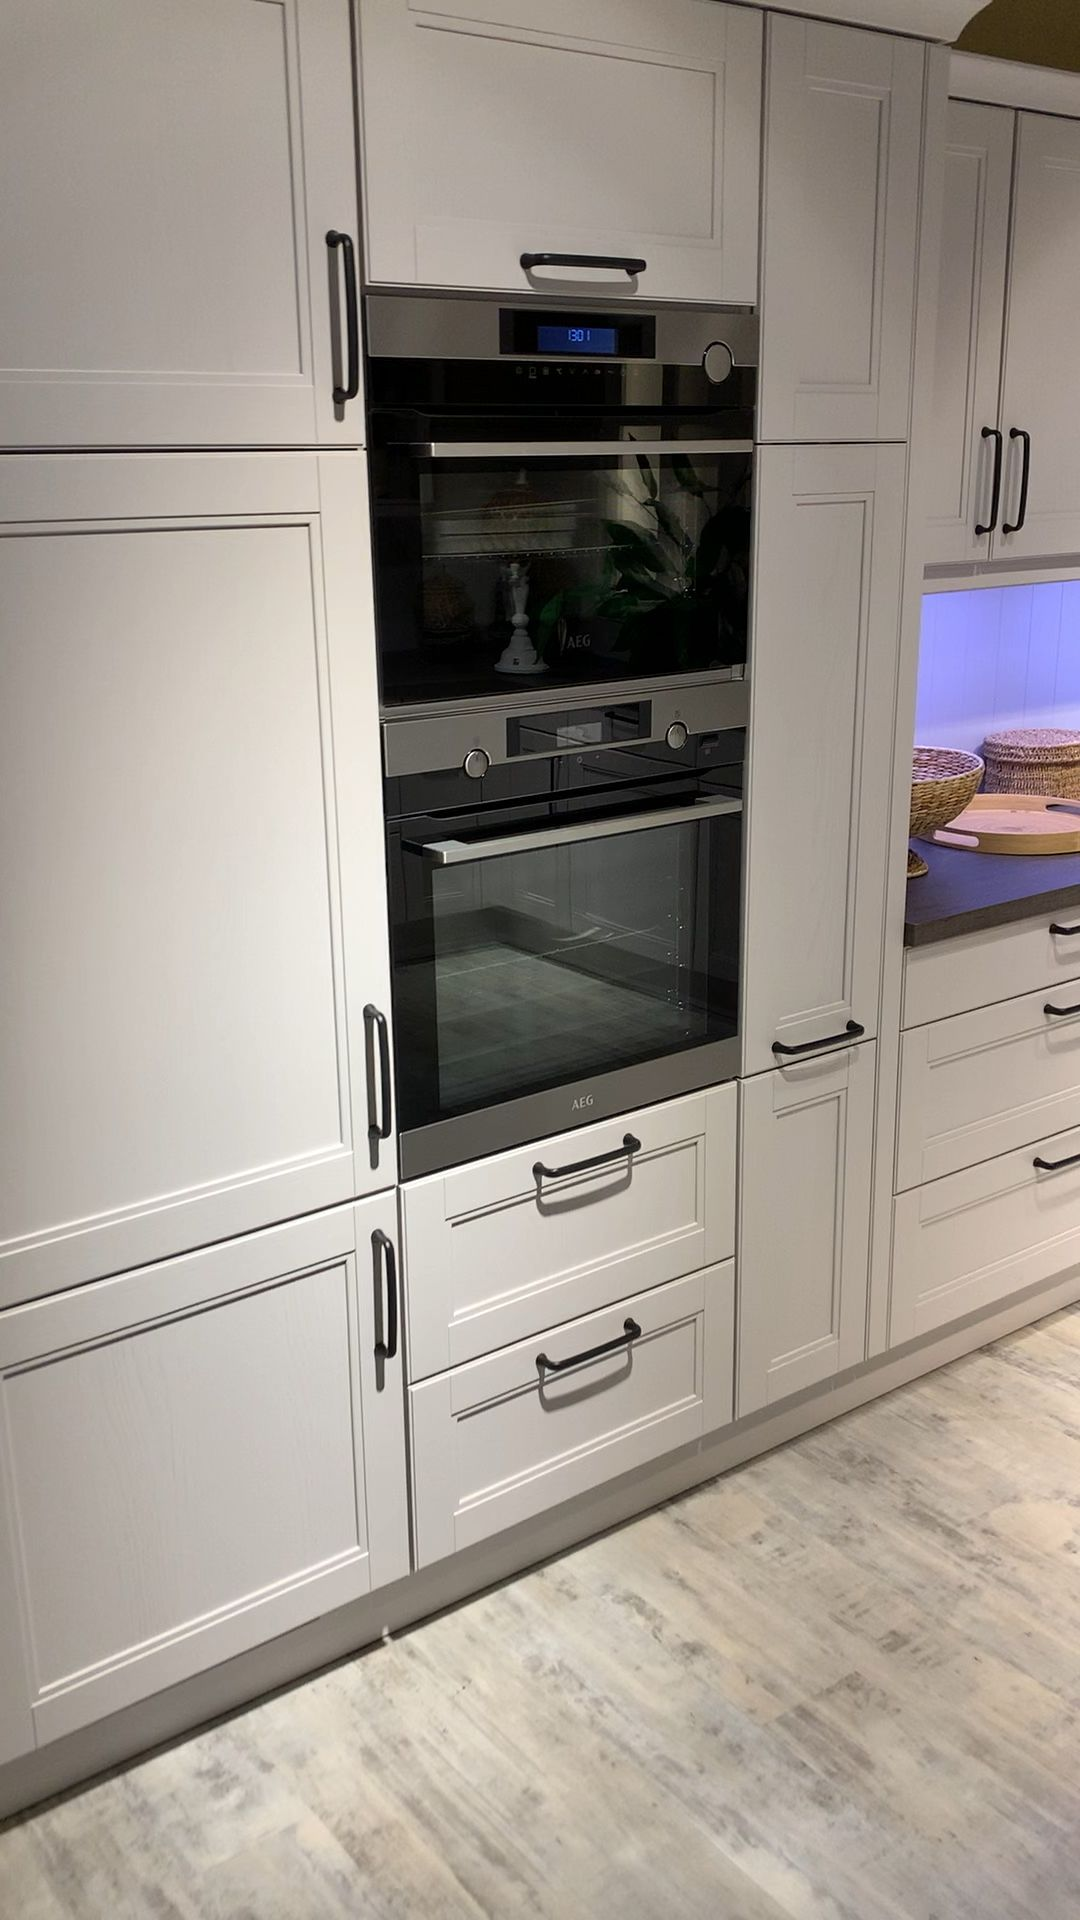 Kuchen Partner Subasi Made In Germany Modernkitchendesign Kitchenideas K In 2020 Interior Design Kitchen Small Kitchen Room Design Interior Design Kitchen